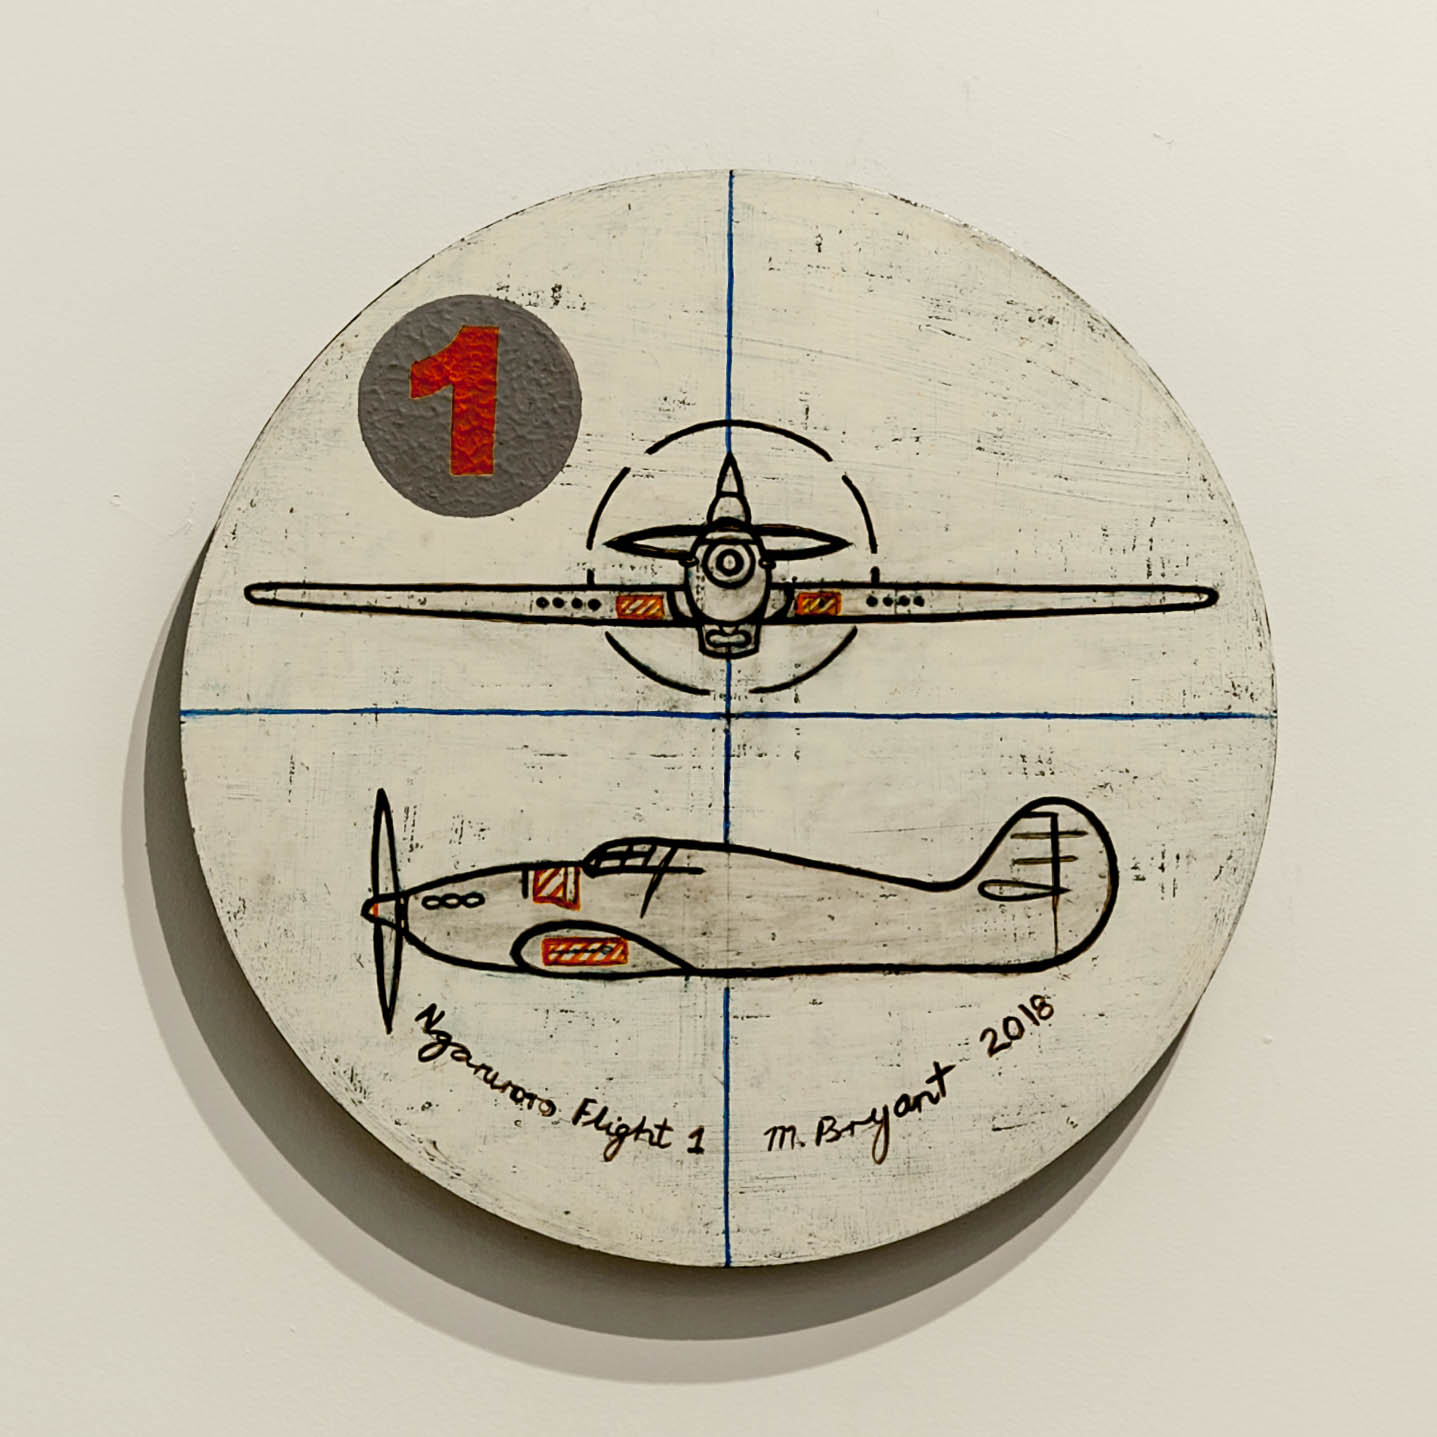 63. SOLD, Michelle Bryant, Ngaruroro Flights I